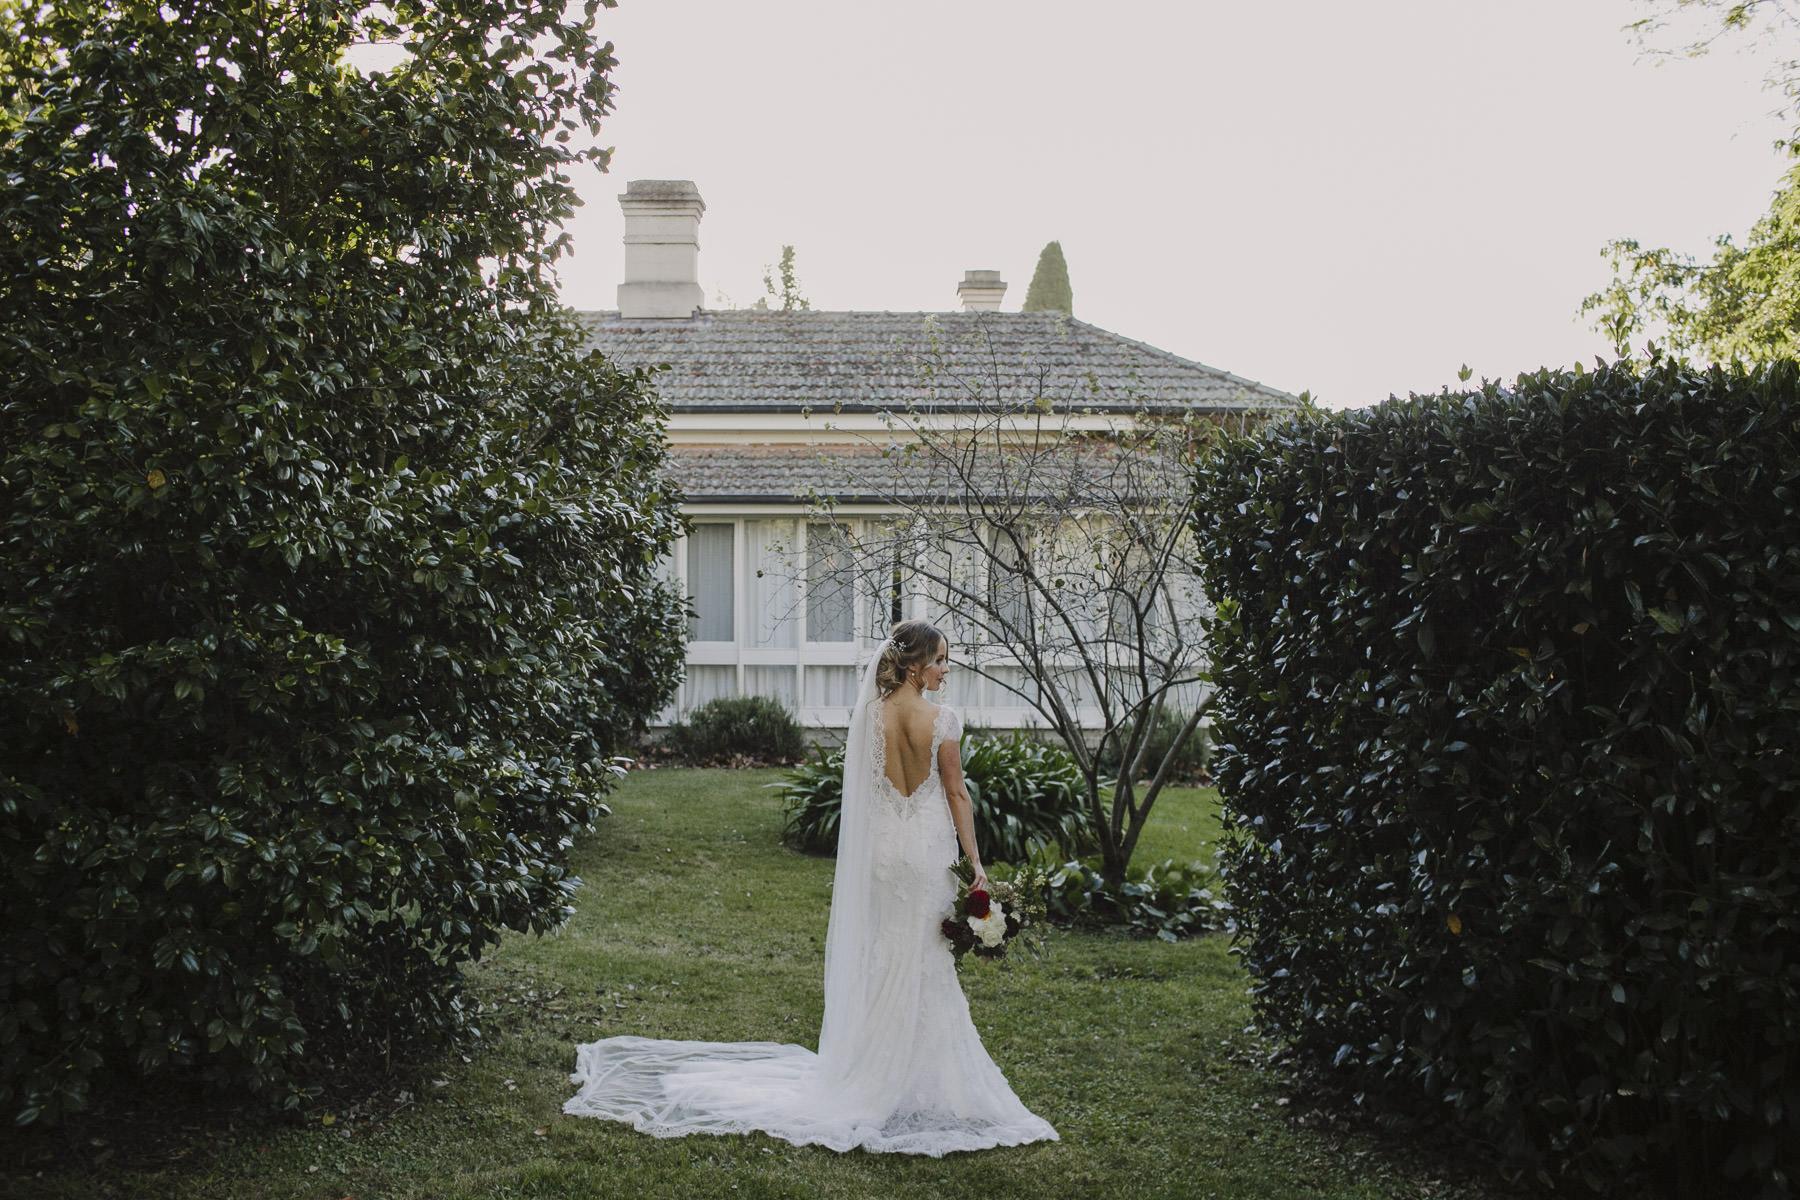 160506_justinaaron_wedding_holly_daniel_pr-148.jpg